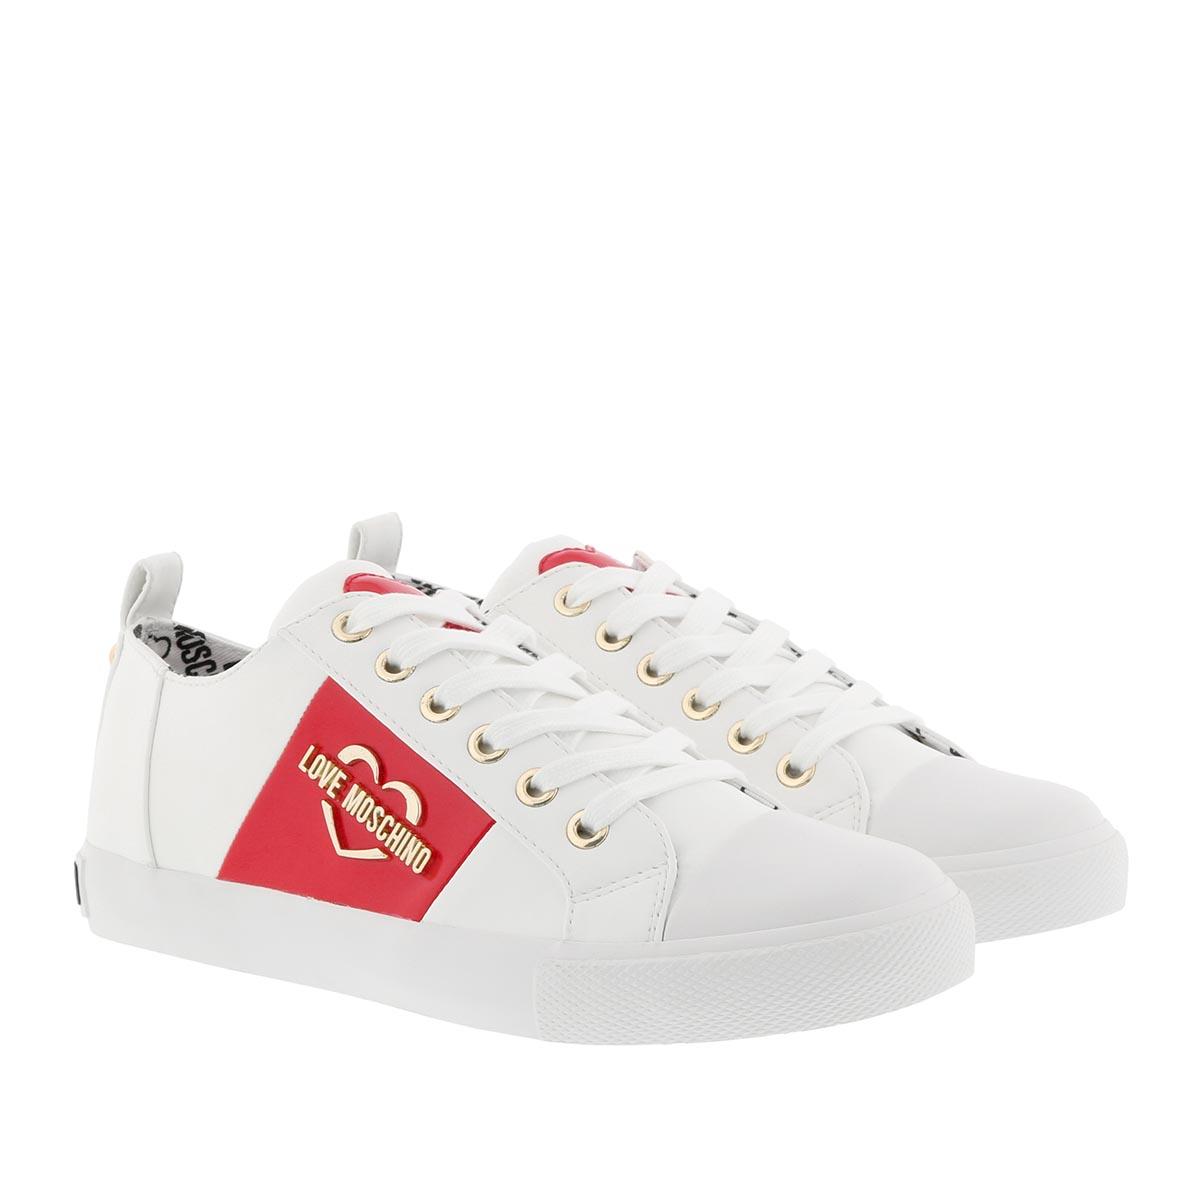 Love Moschino Sneakers - Gomma Sneaker Bianco - in weiß - für Damen